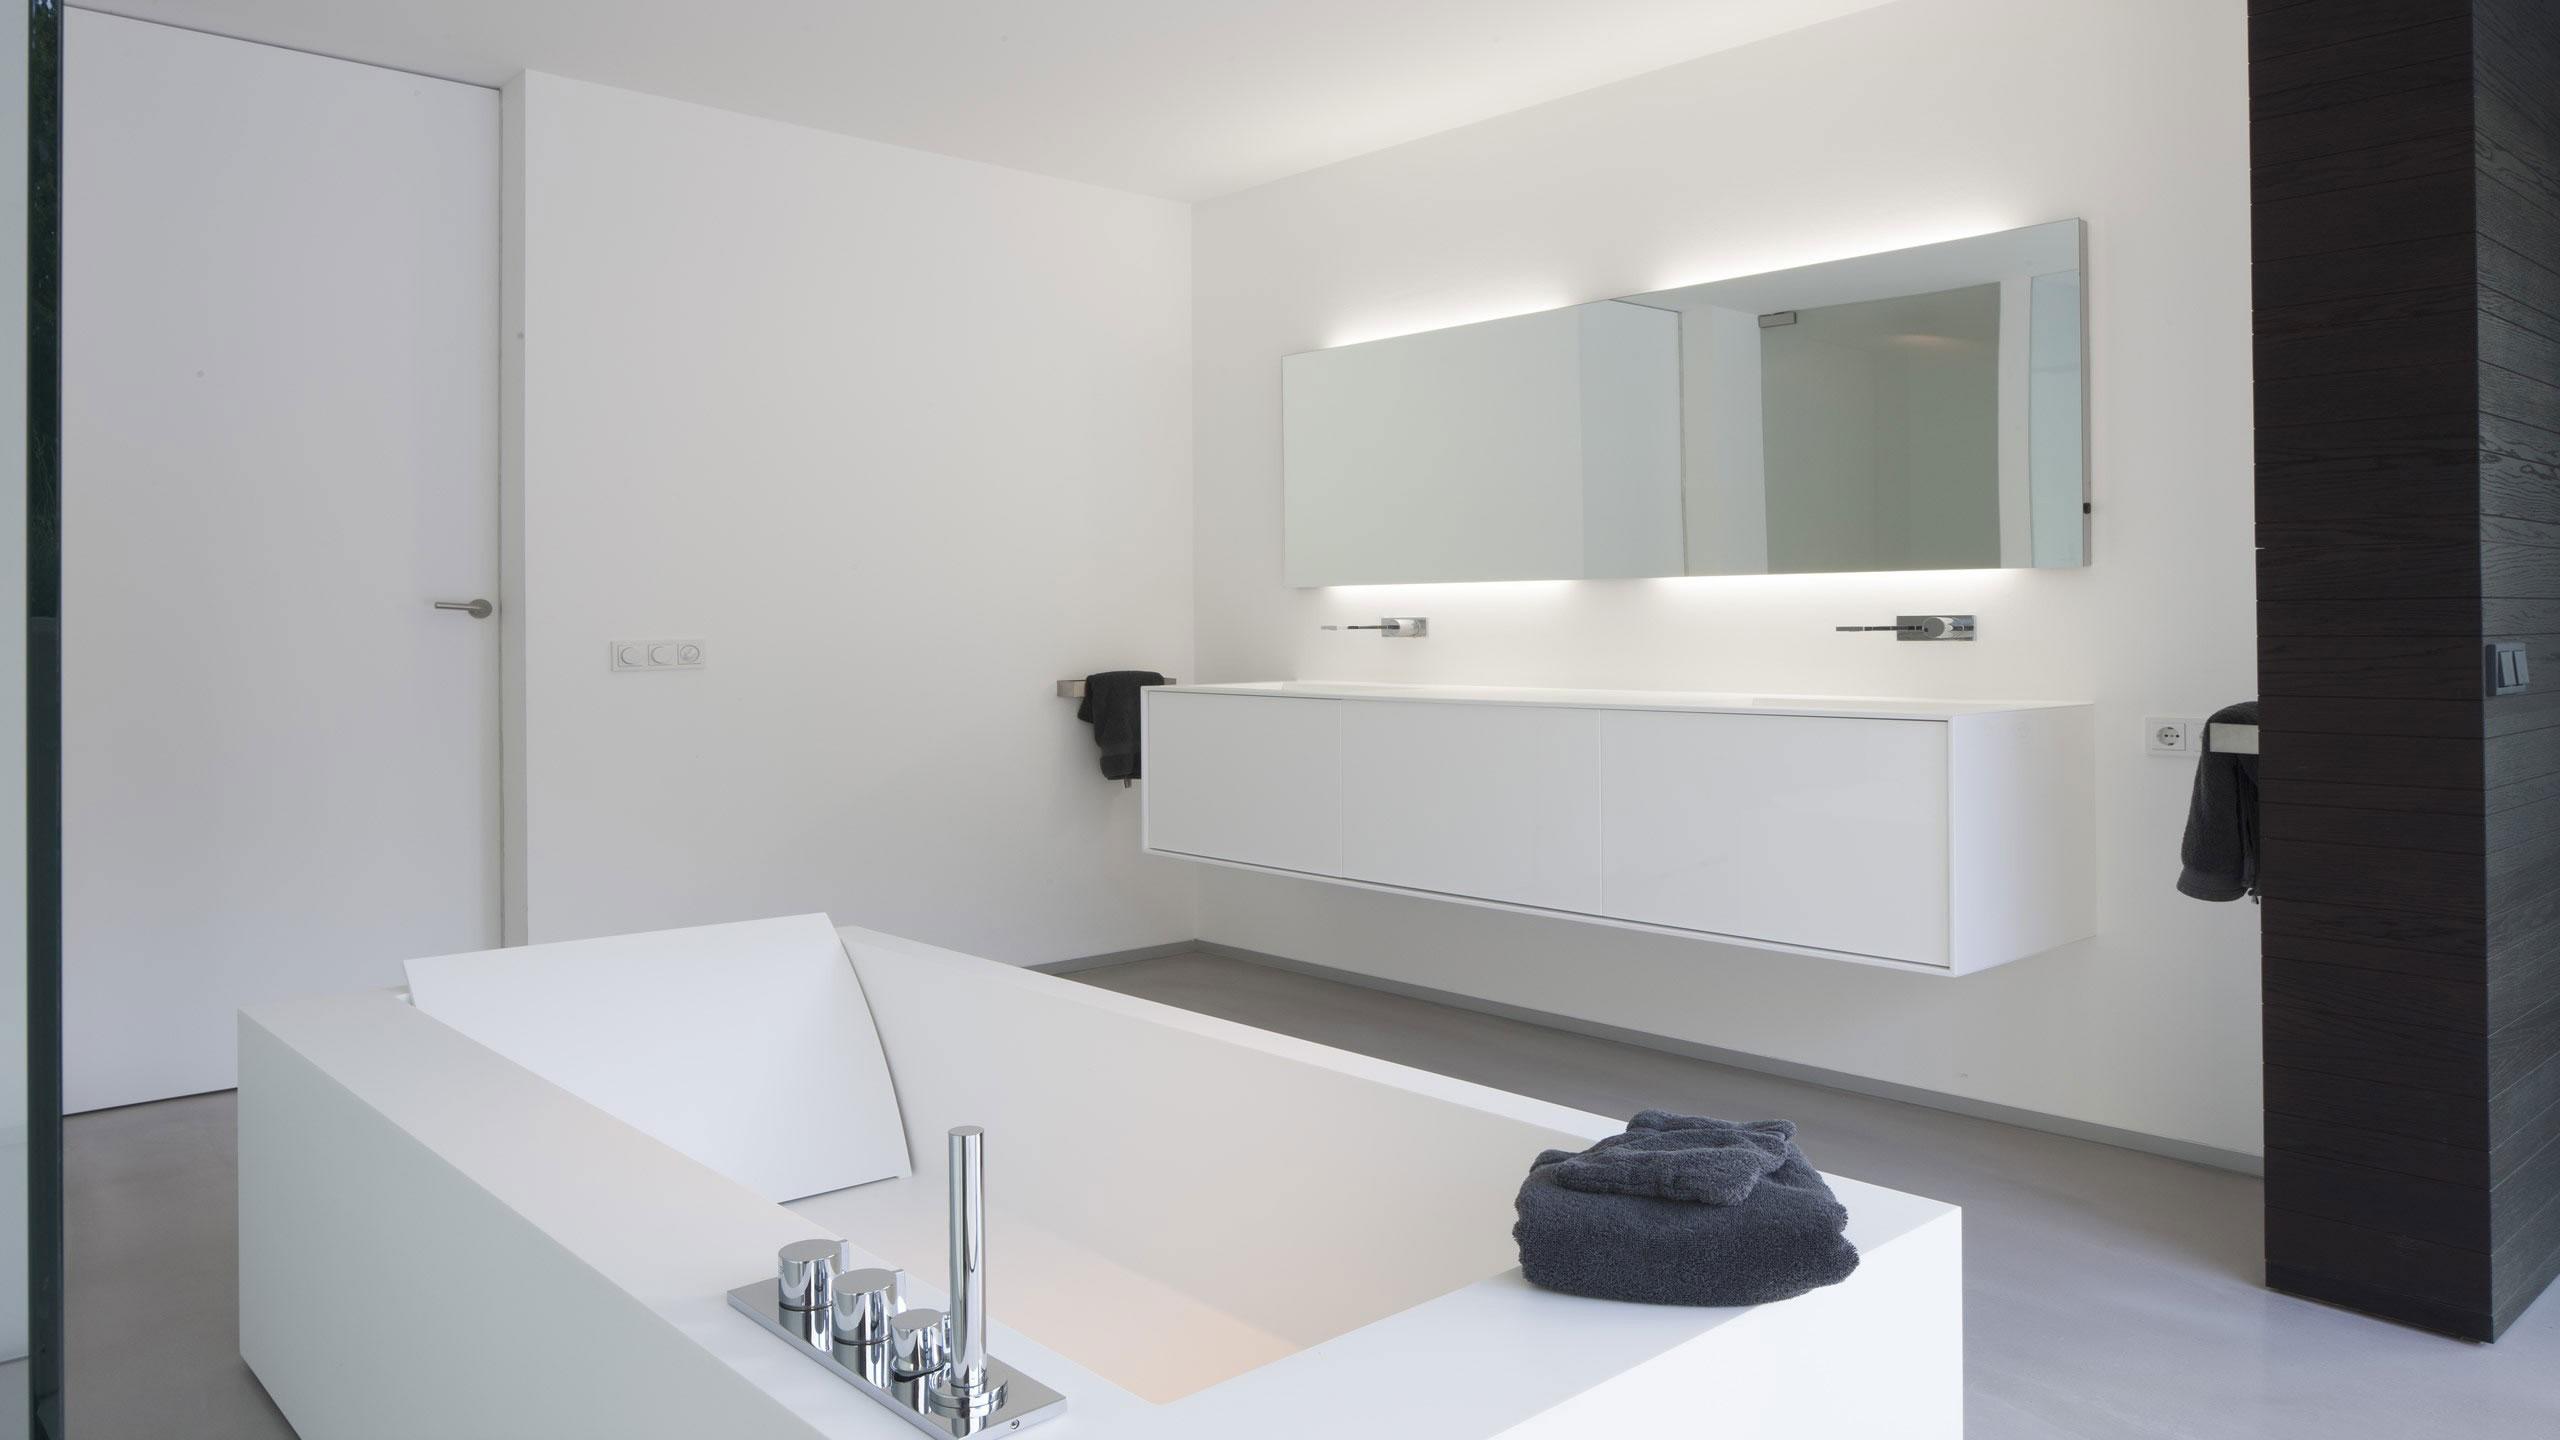 Boxed Villa Spee Haelen with Panoramic Windows by Lab32 architecten-25